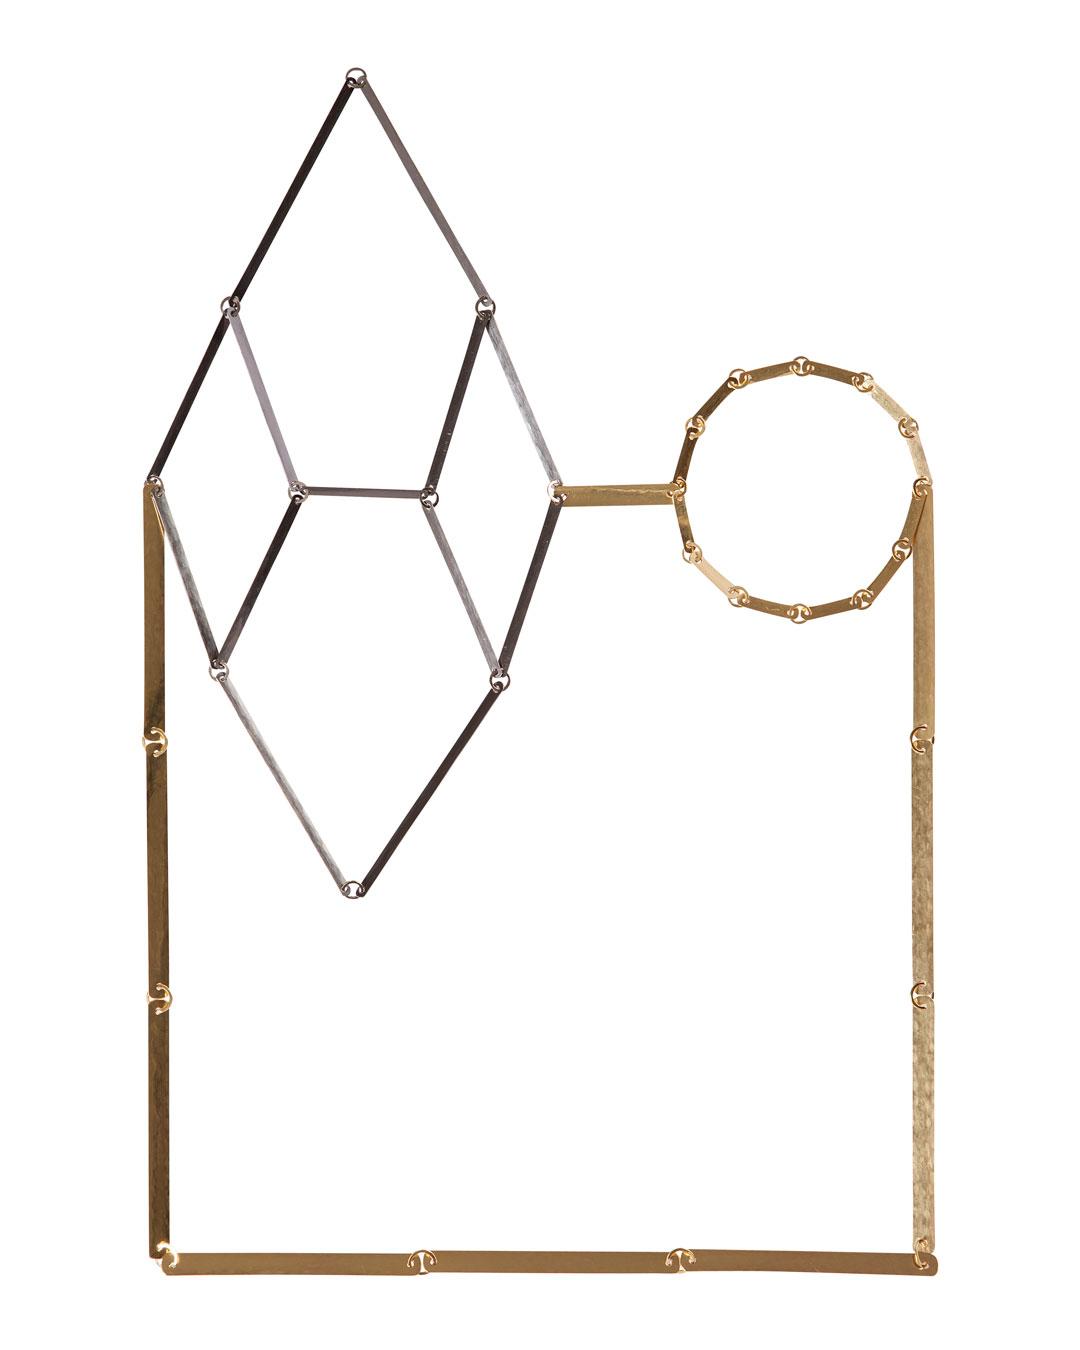 Annelies Planteijdt, Mooie Stad – Zwarte Kristal, 2015 (1/5), halssieraad; goud, tantalium, 180 x 270 mm, €8150 (afbeelding 1/2)